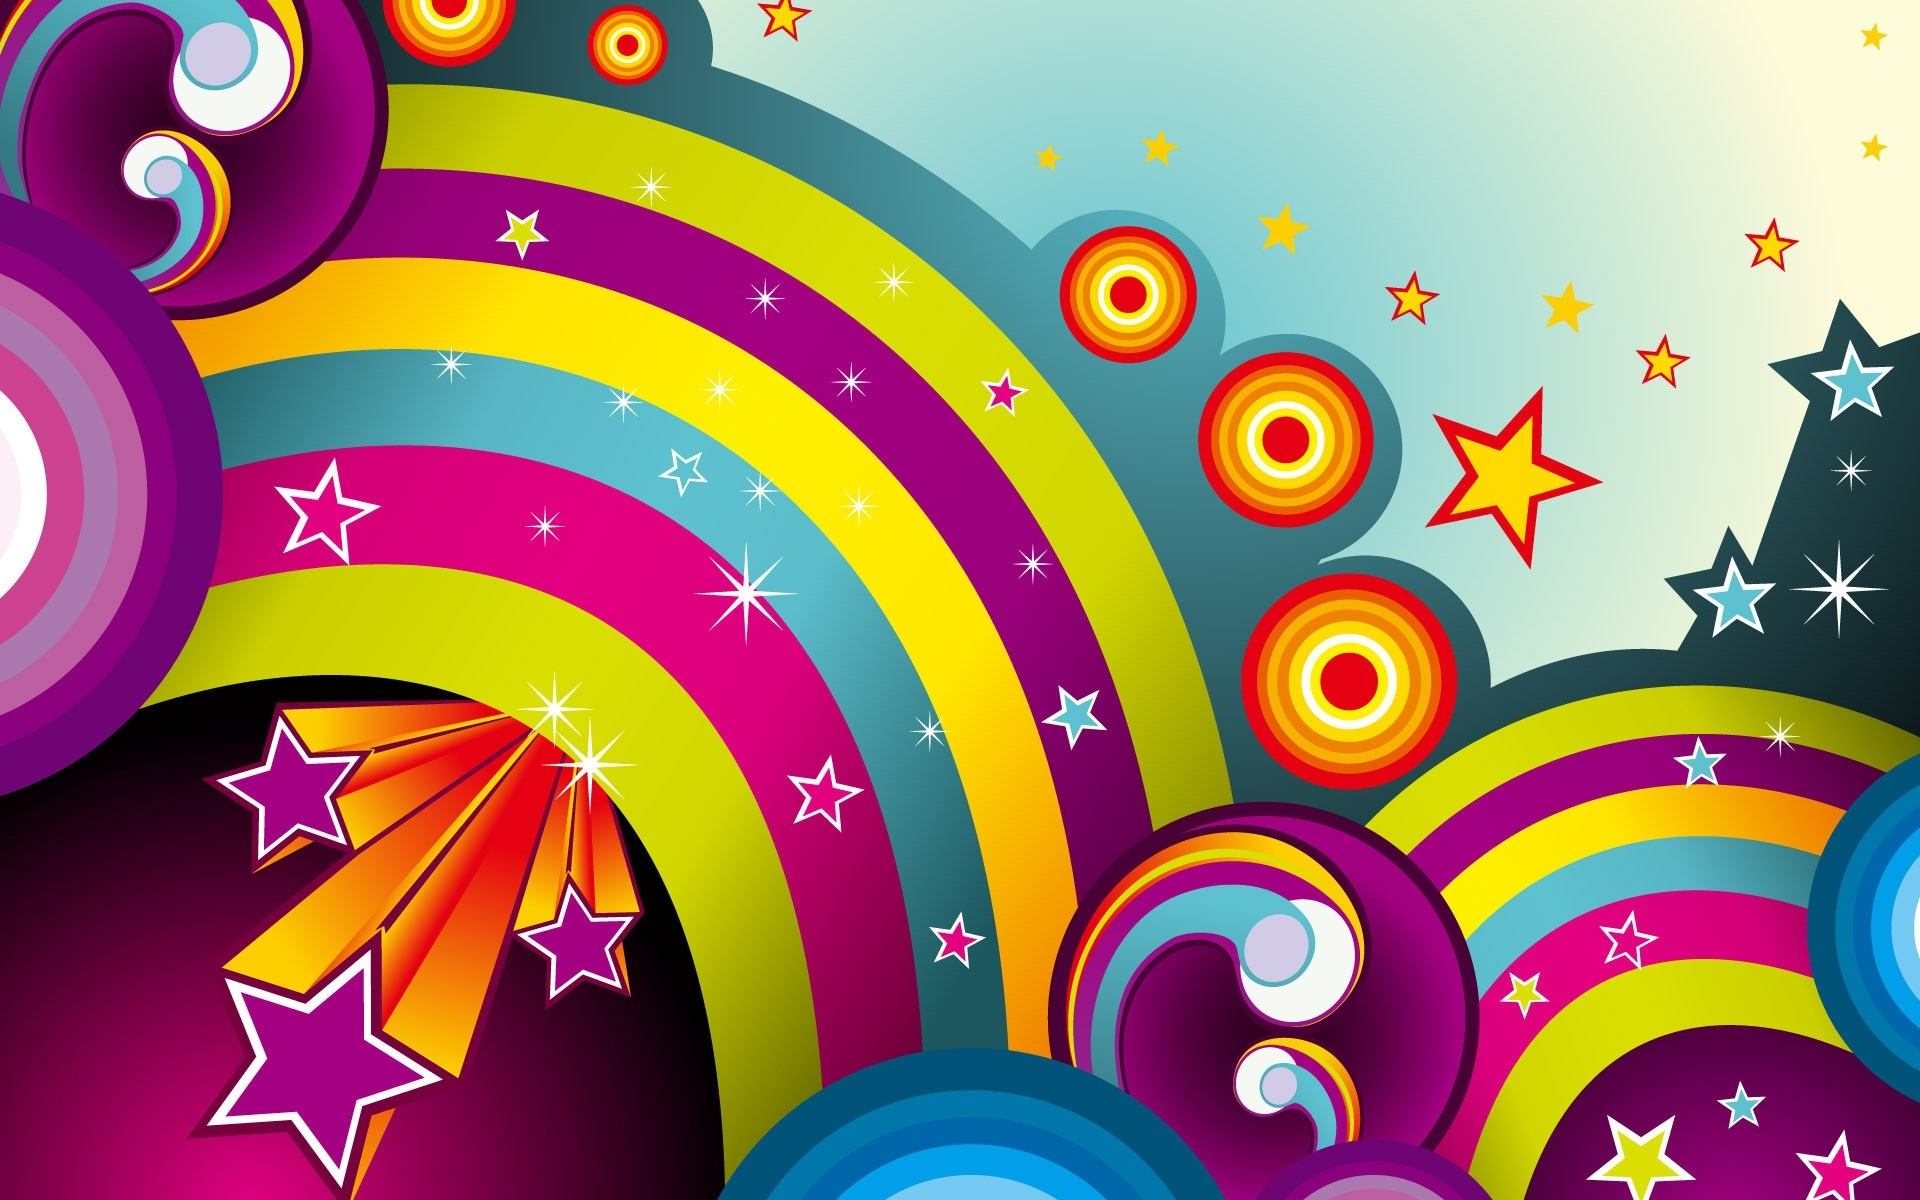 Drawings Illustration Design Decoration Desktop Abstract Art Wallpaper Pattern Party Vector Fun Motley Rainbow Bright Celebration